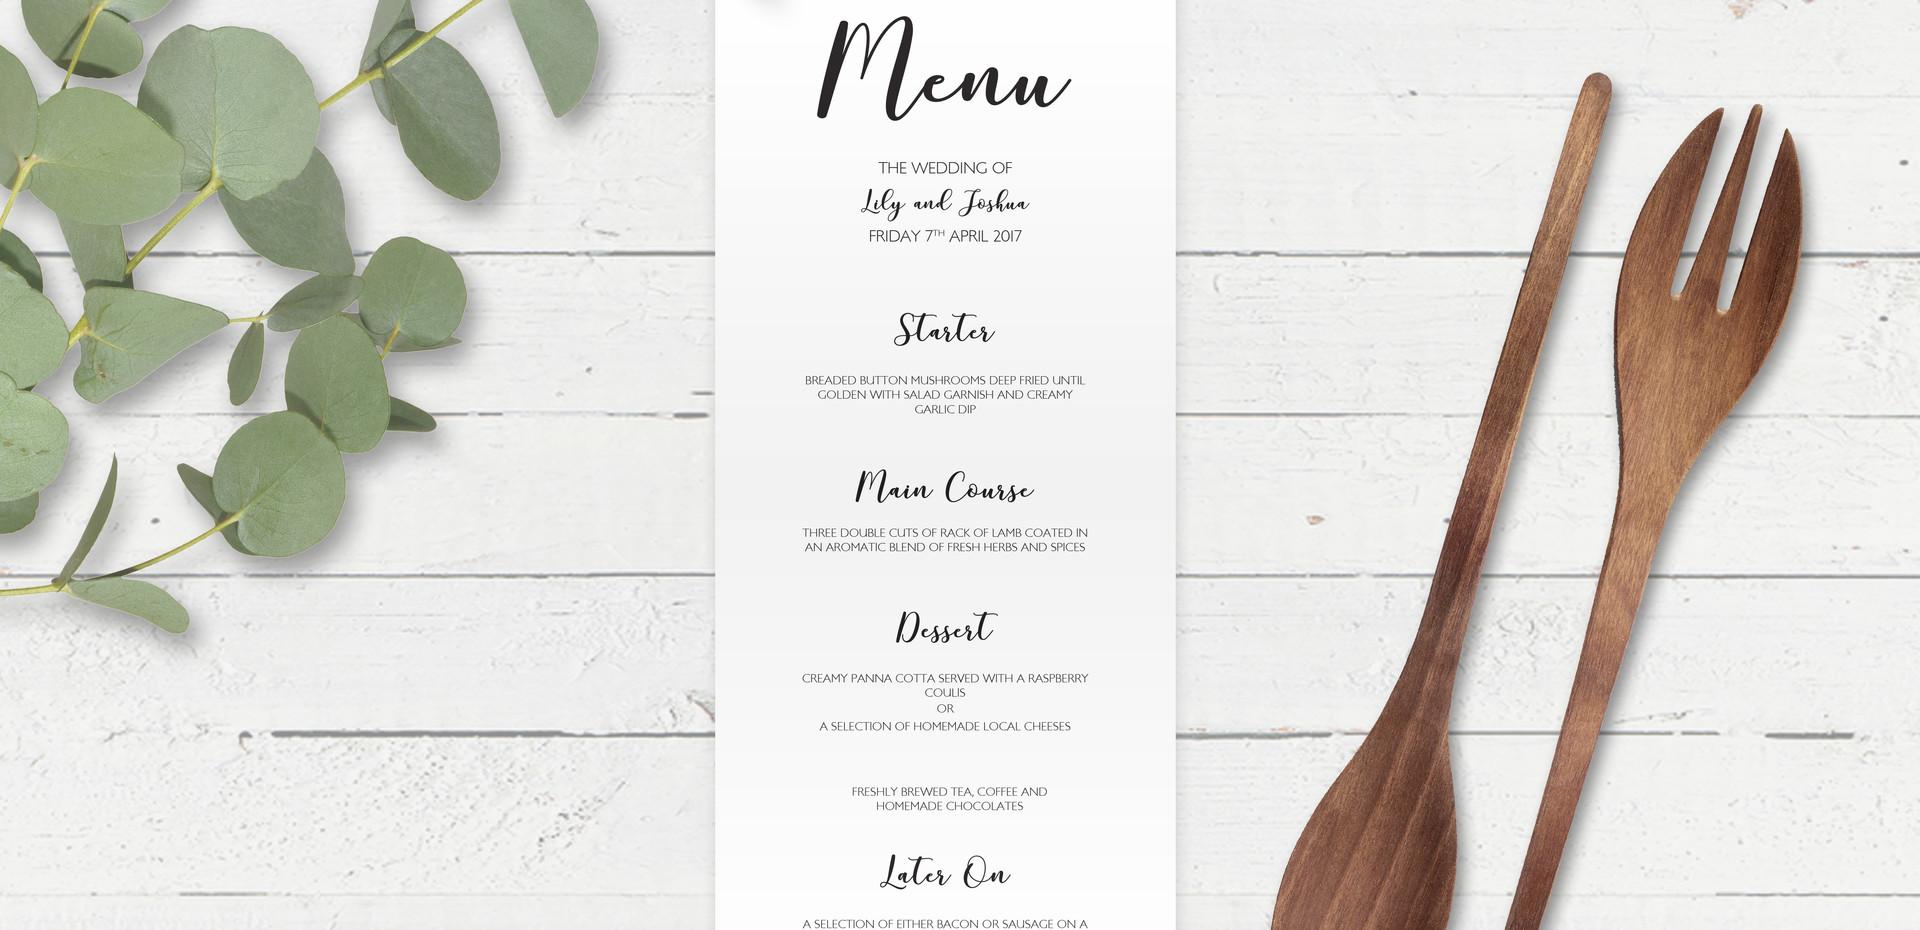 Big Caligraphy Bespoke Wedding Invitations, Save the Dates, RSVPs and Wedding Menus personalised wedding stationery by Bespoke Invites